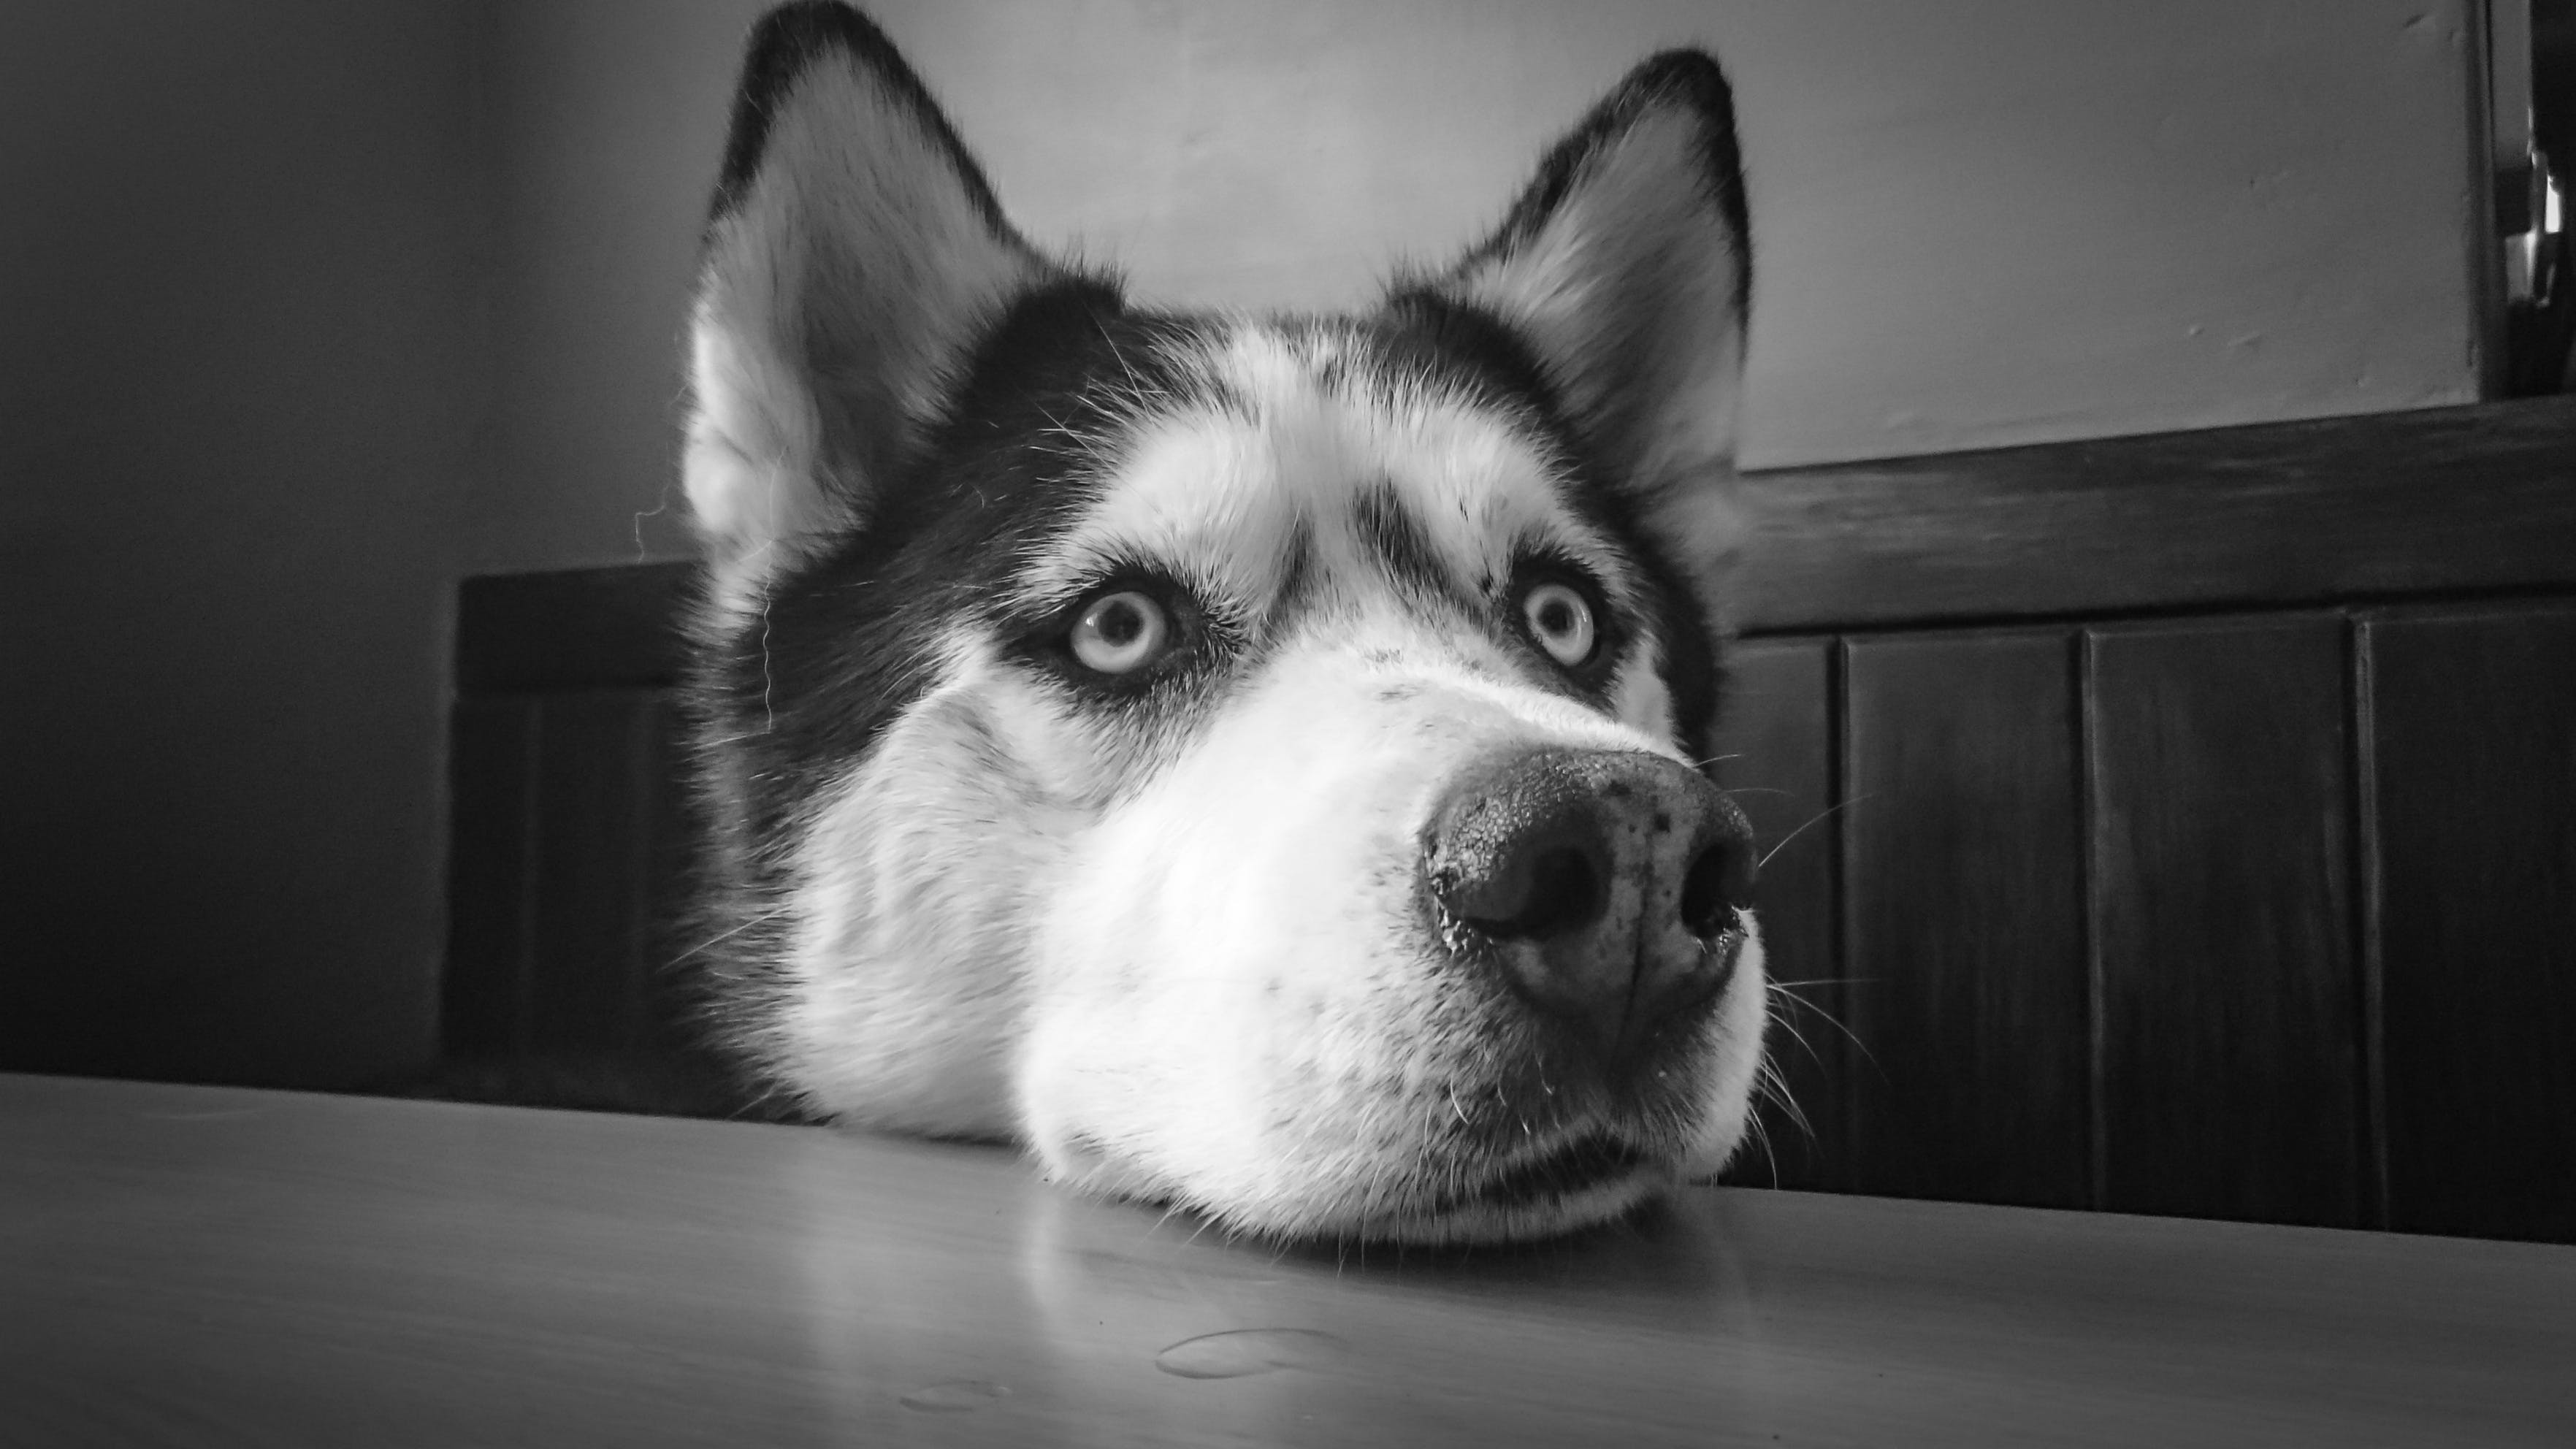 Siberian Husky Leaning on Table